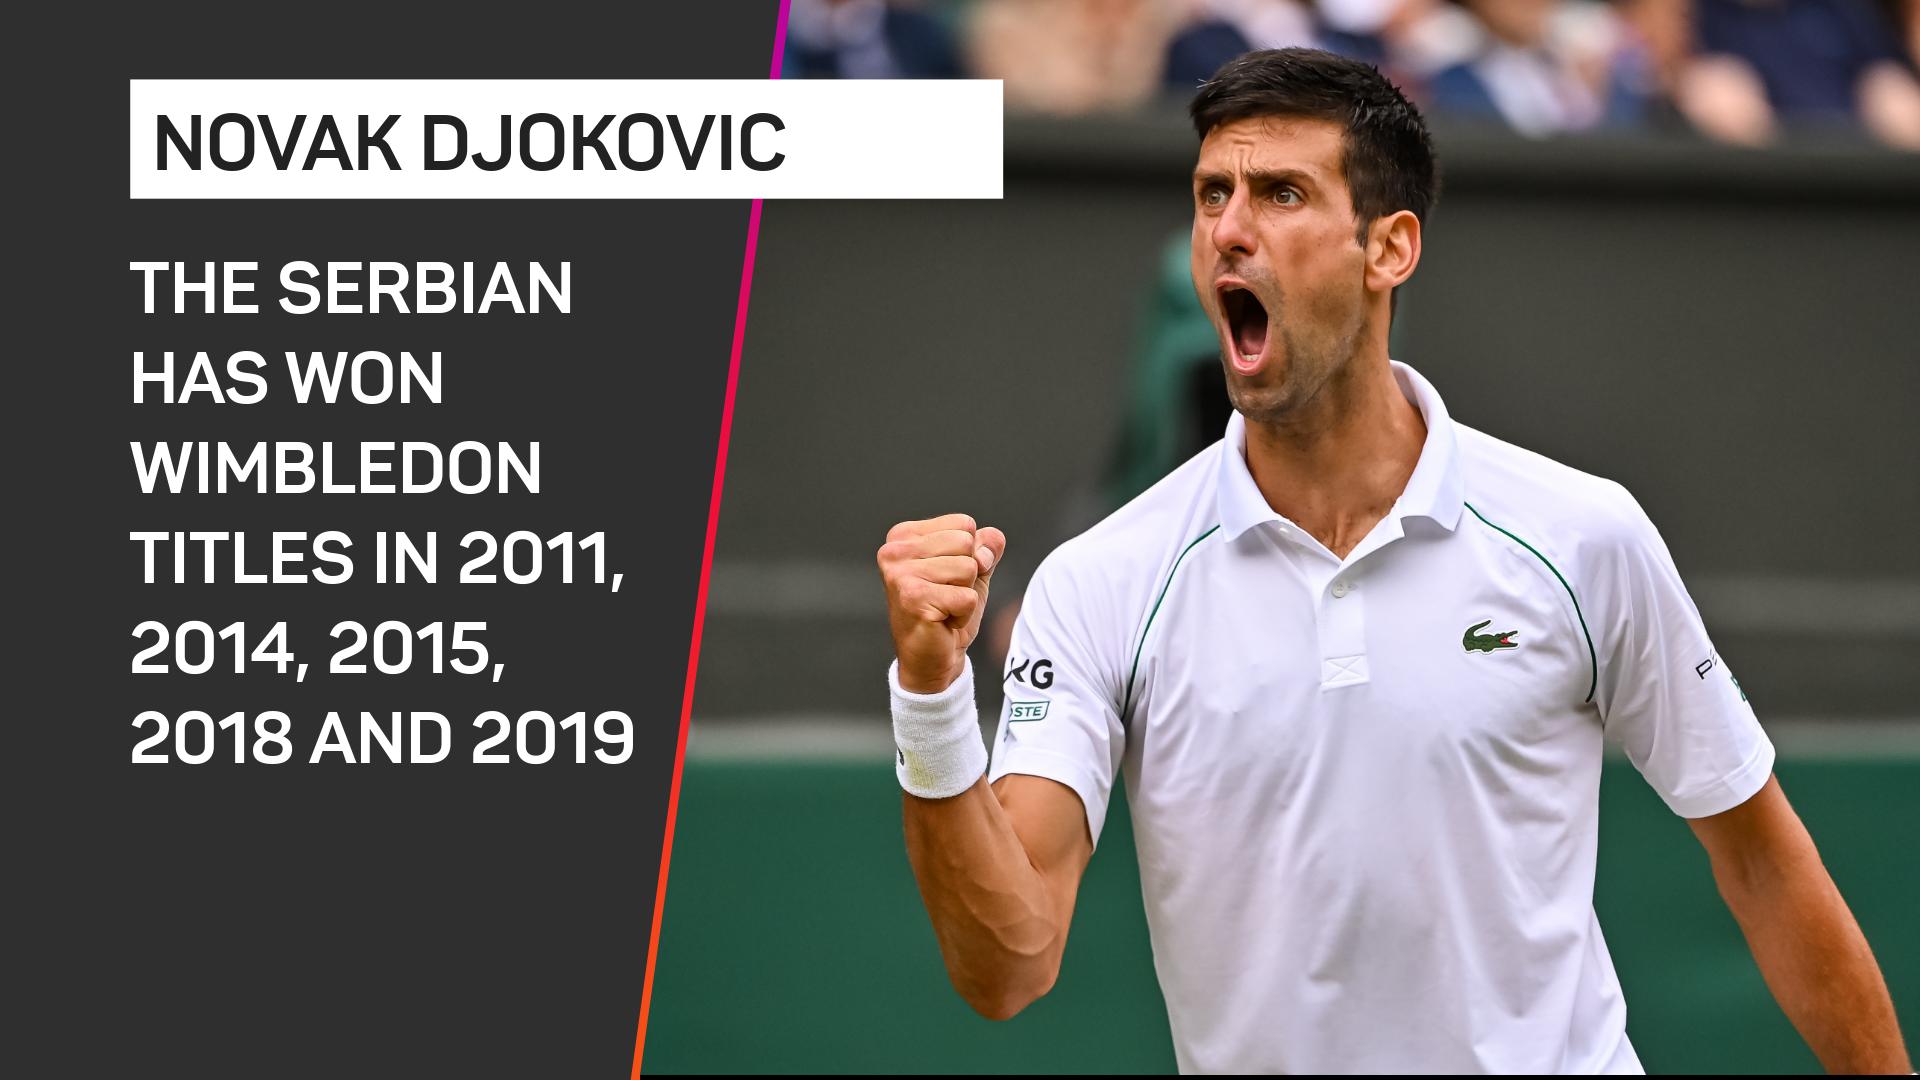 Novak Djokovic Wimbledon record